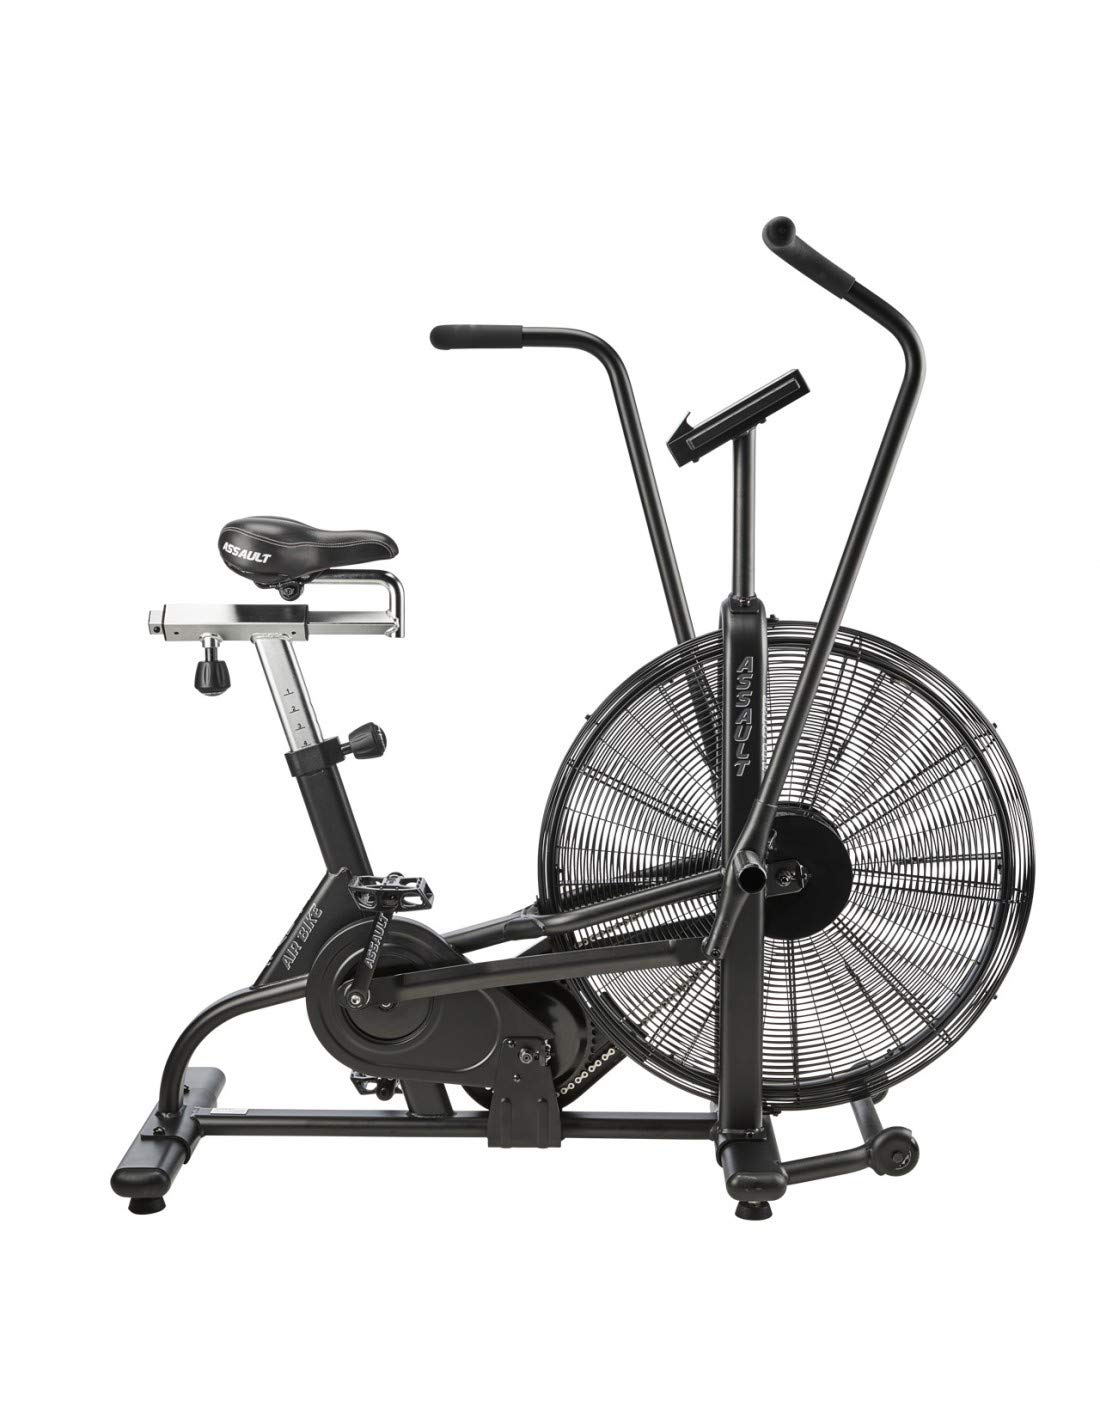 EMOM Fitness Assault Fitness Air Bike Angebot Classic